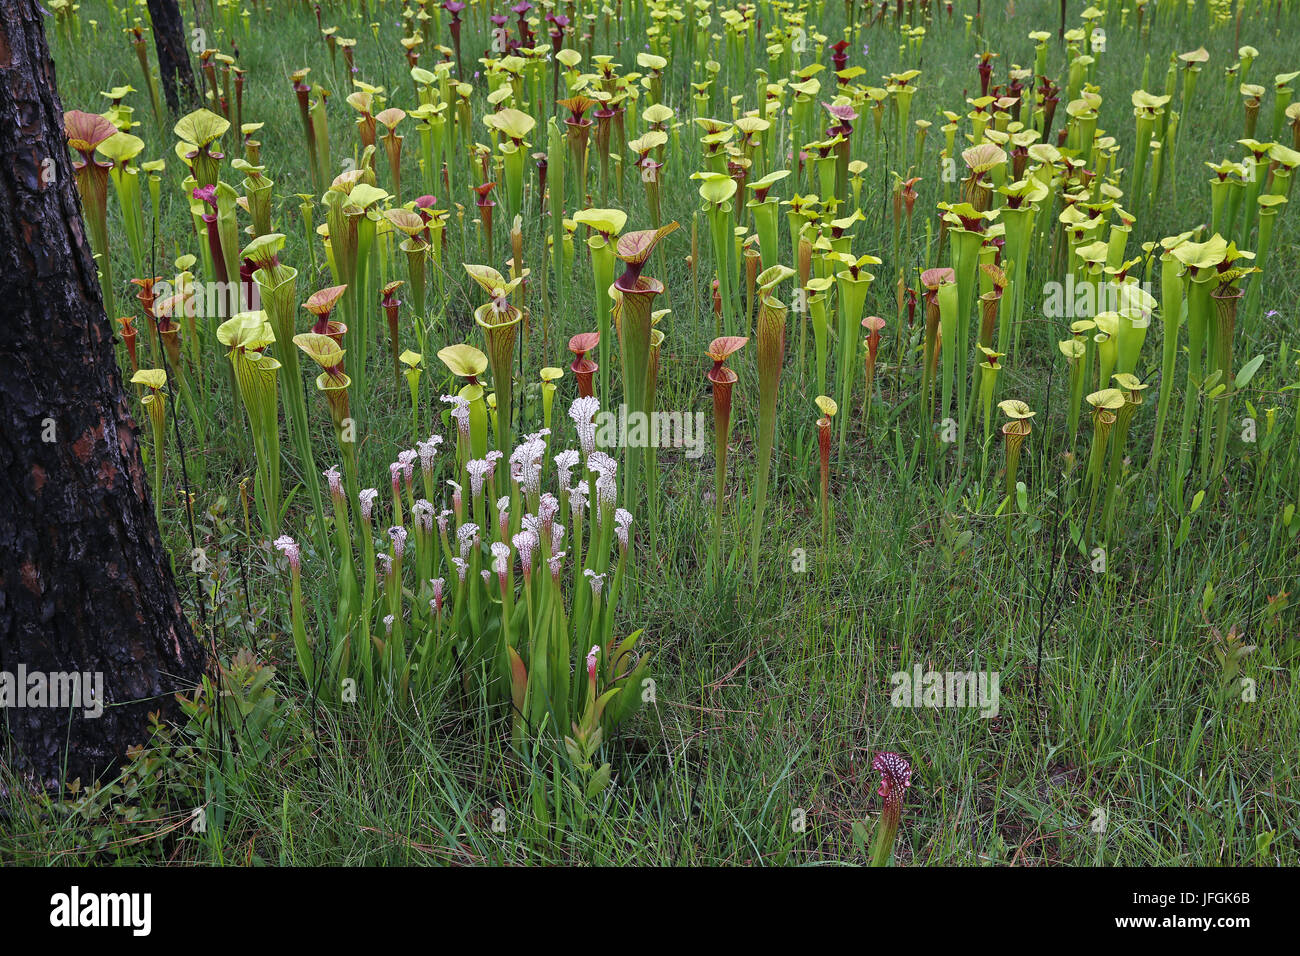 Pitcher Plants (Sarracenia) growing in hillside seepage bog, SE USA - Stock Image